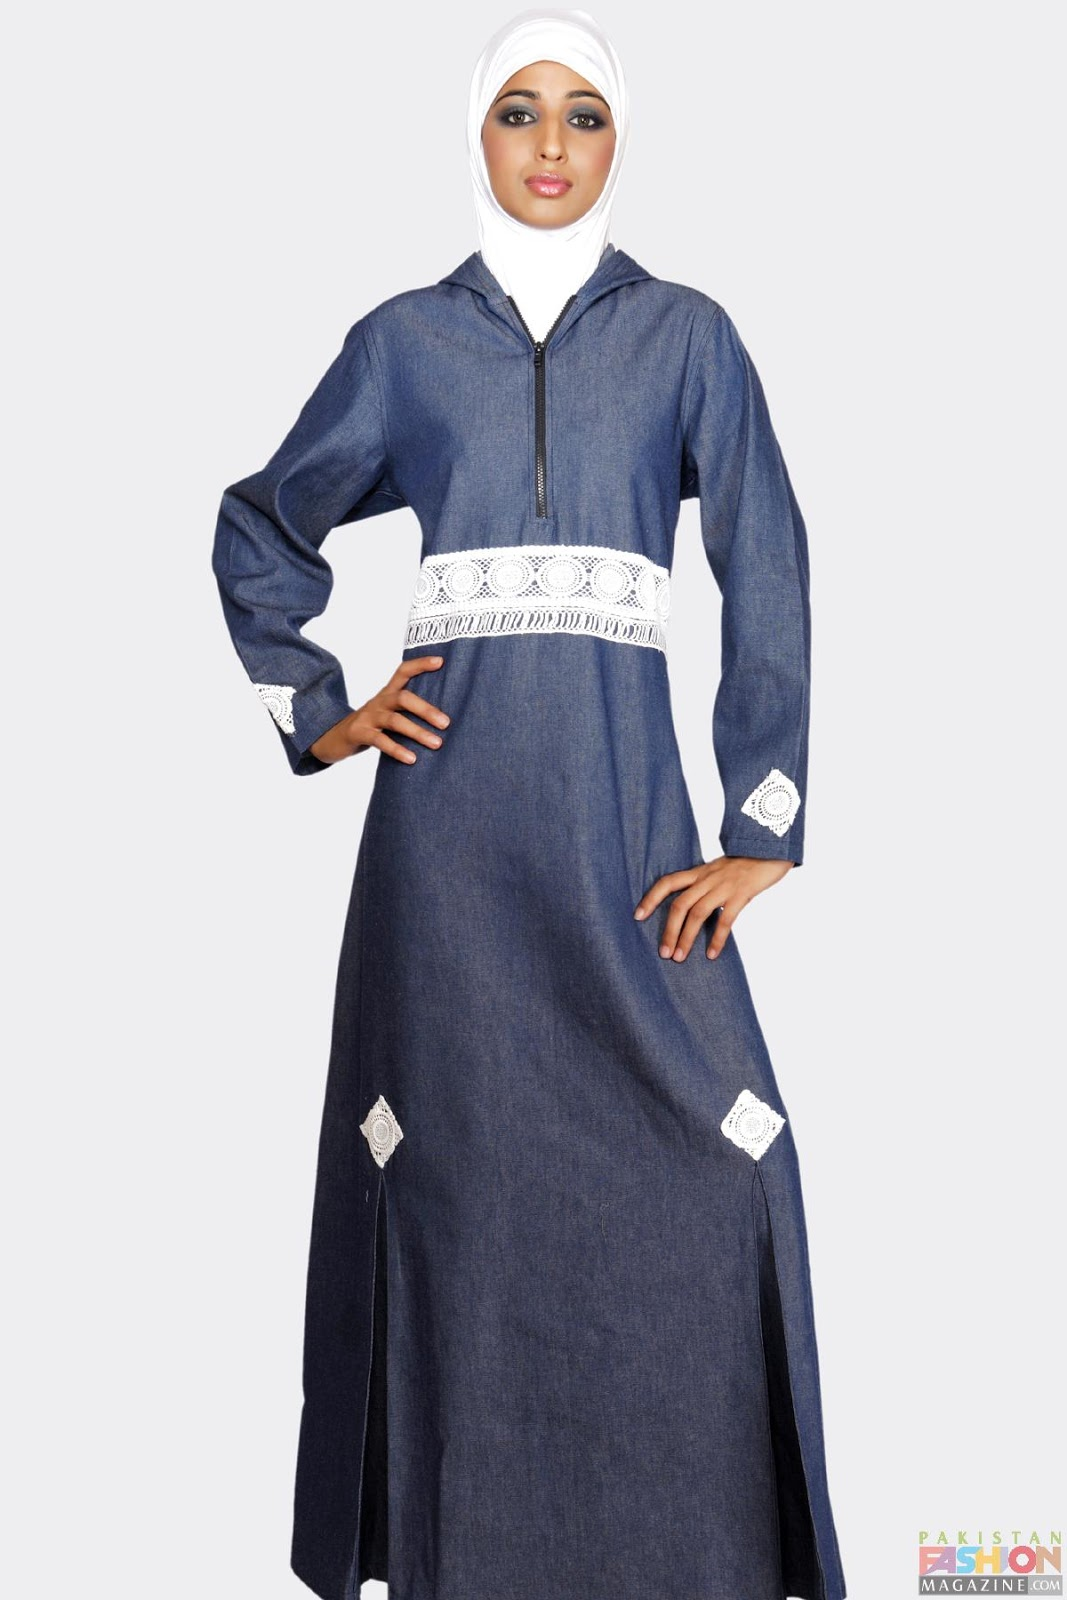 Creative Muslim Women Clothing Online Shopping  MyBatuacom  Lashirah Tunic